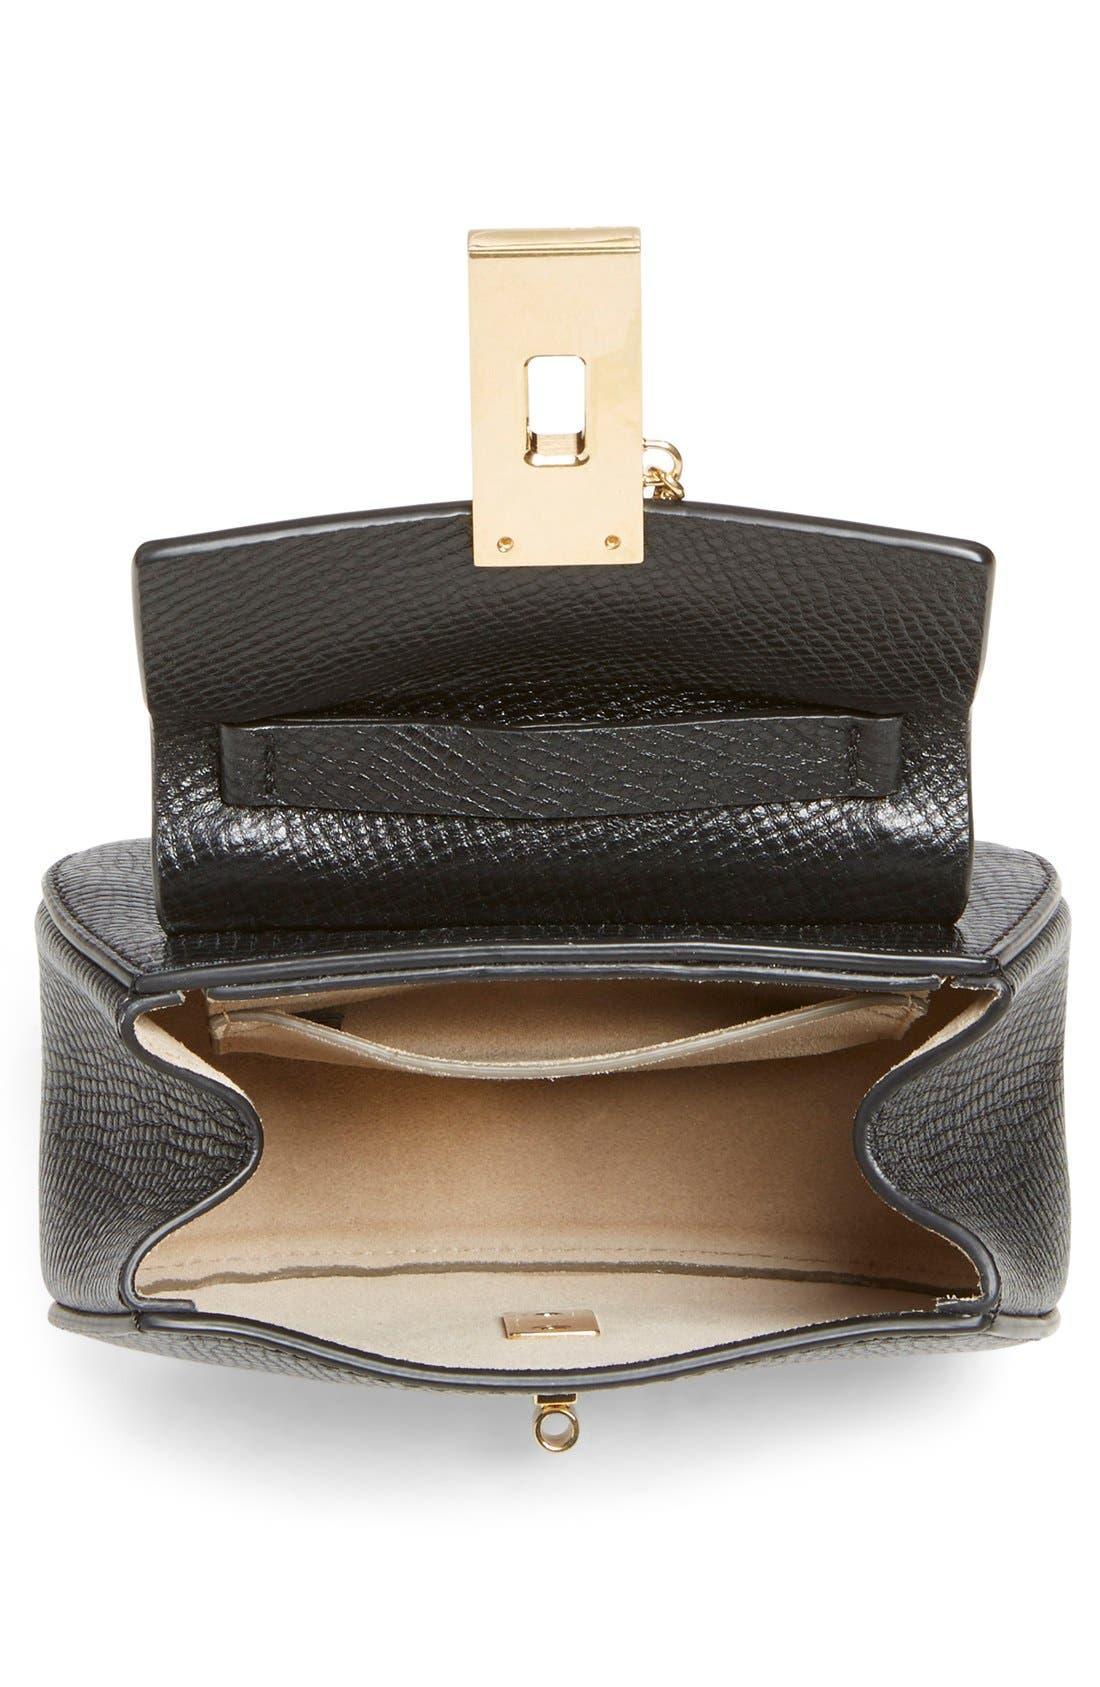 Alternate Image 3  - Chloé 'Nano Drew' Lambskin & Calfskin Leather Shoulder Bag